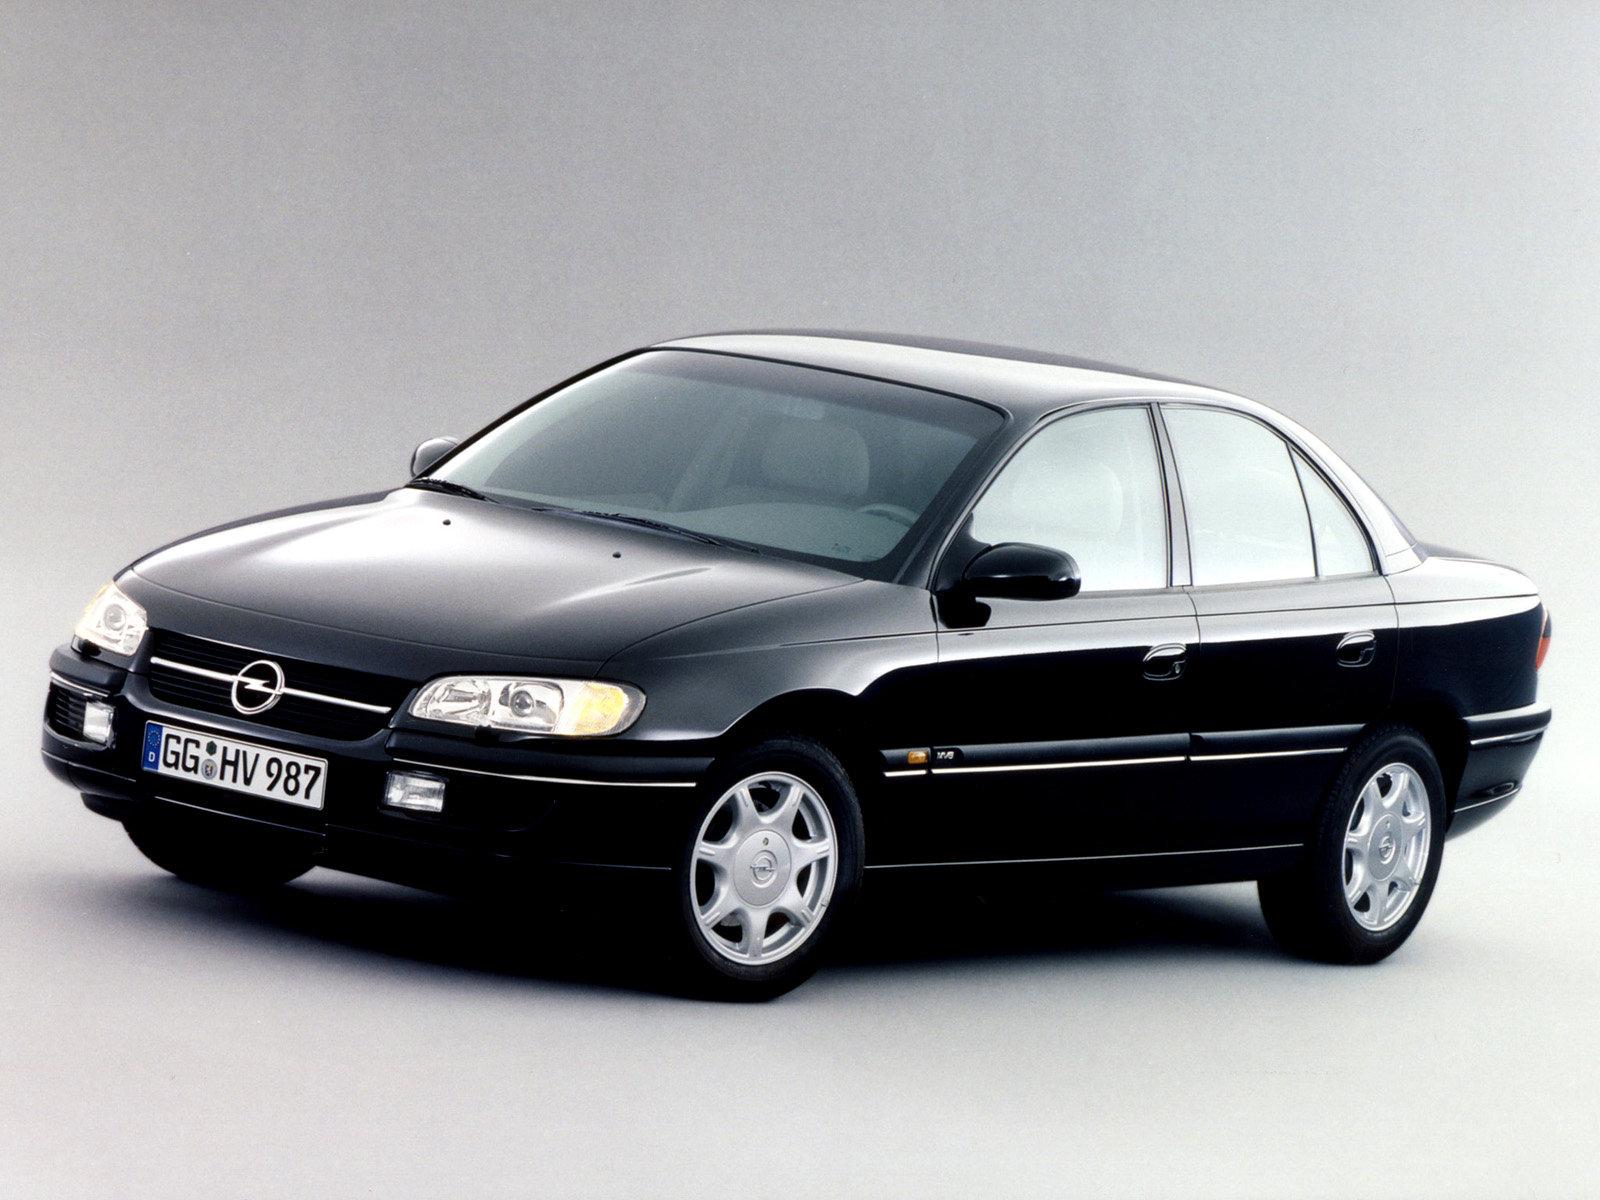 опель омега 1997 акпп 136 расход топливо